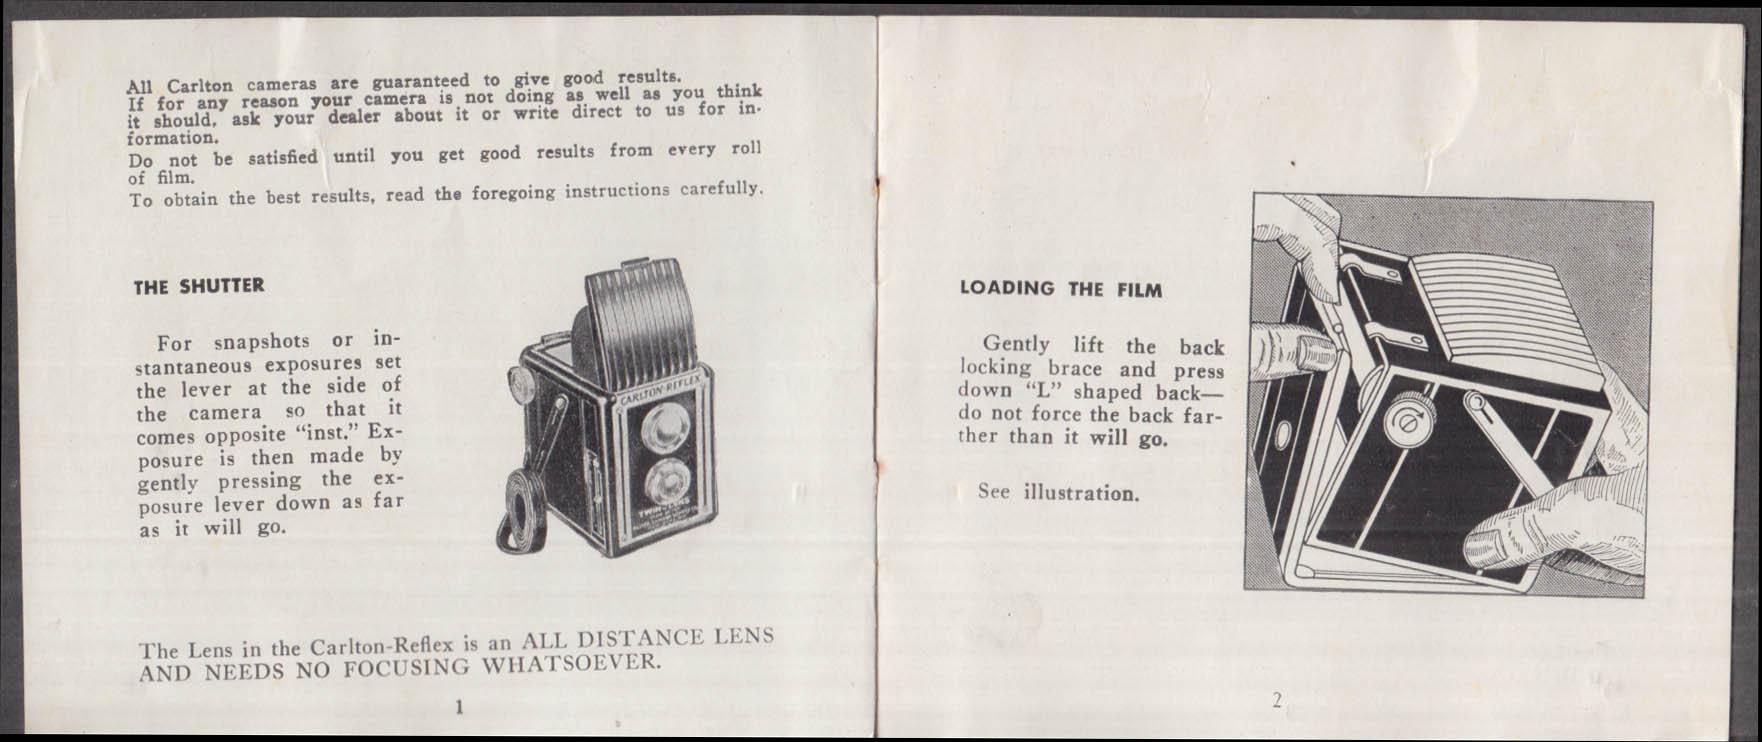 Carlton Reflex Camera Instructions booklet ca 1940s Utility Mfg NYC